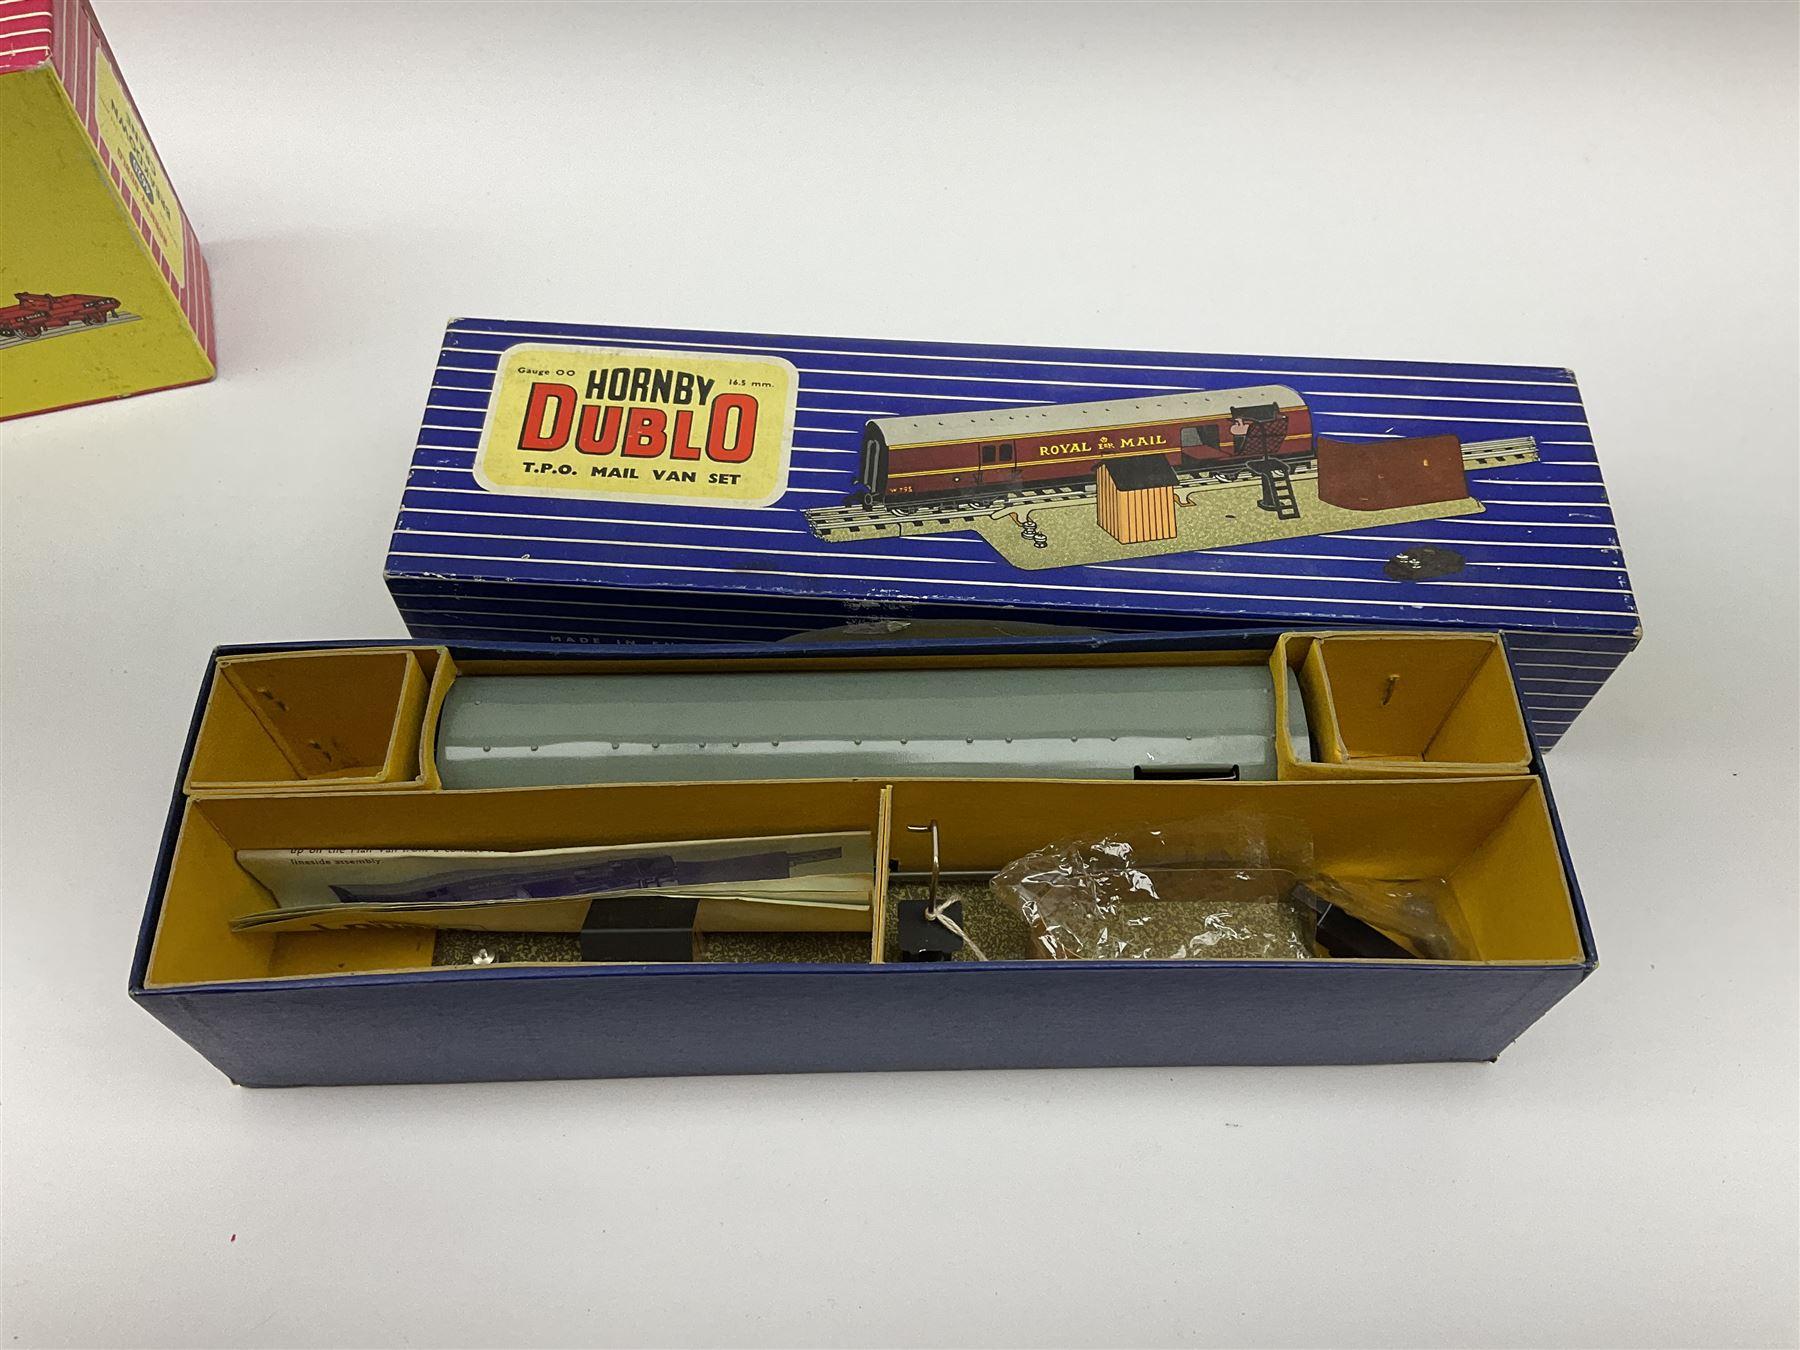 Hornby Dublo - Breakdown Crane No.4062 boxed with screw jacks; D1 Girder Bridge - Image 2 of 4